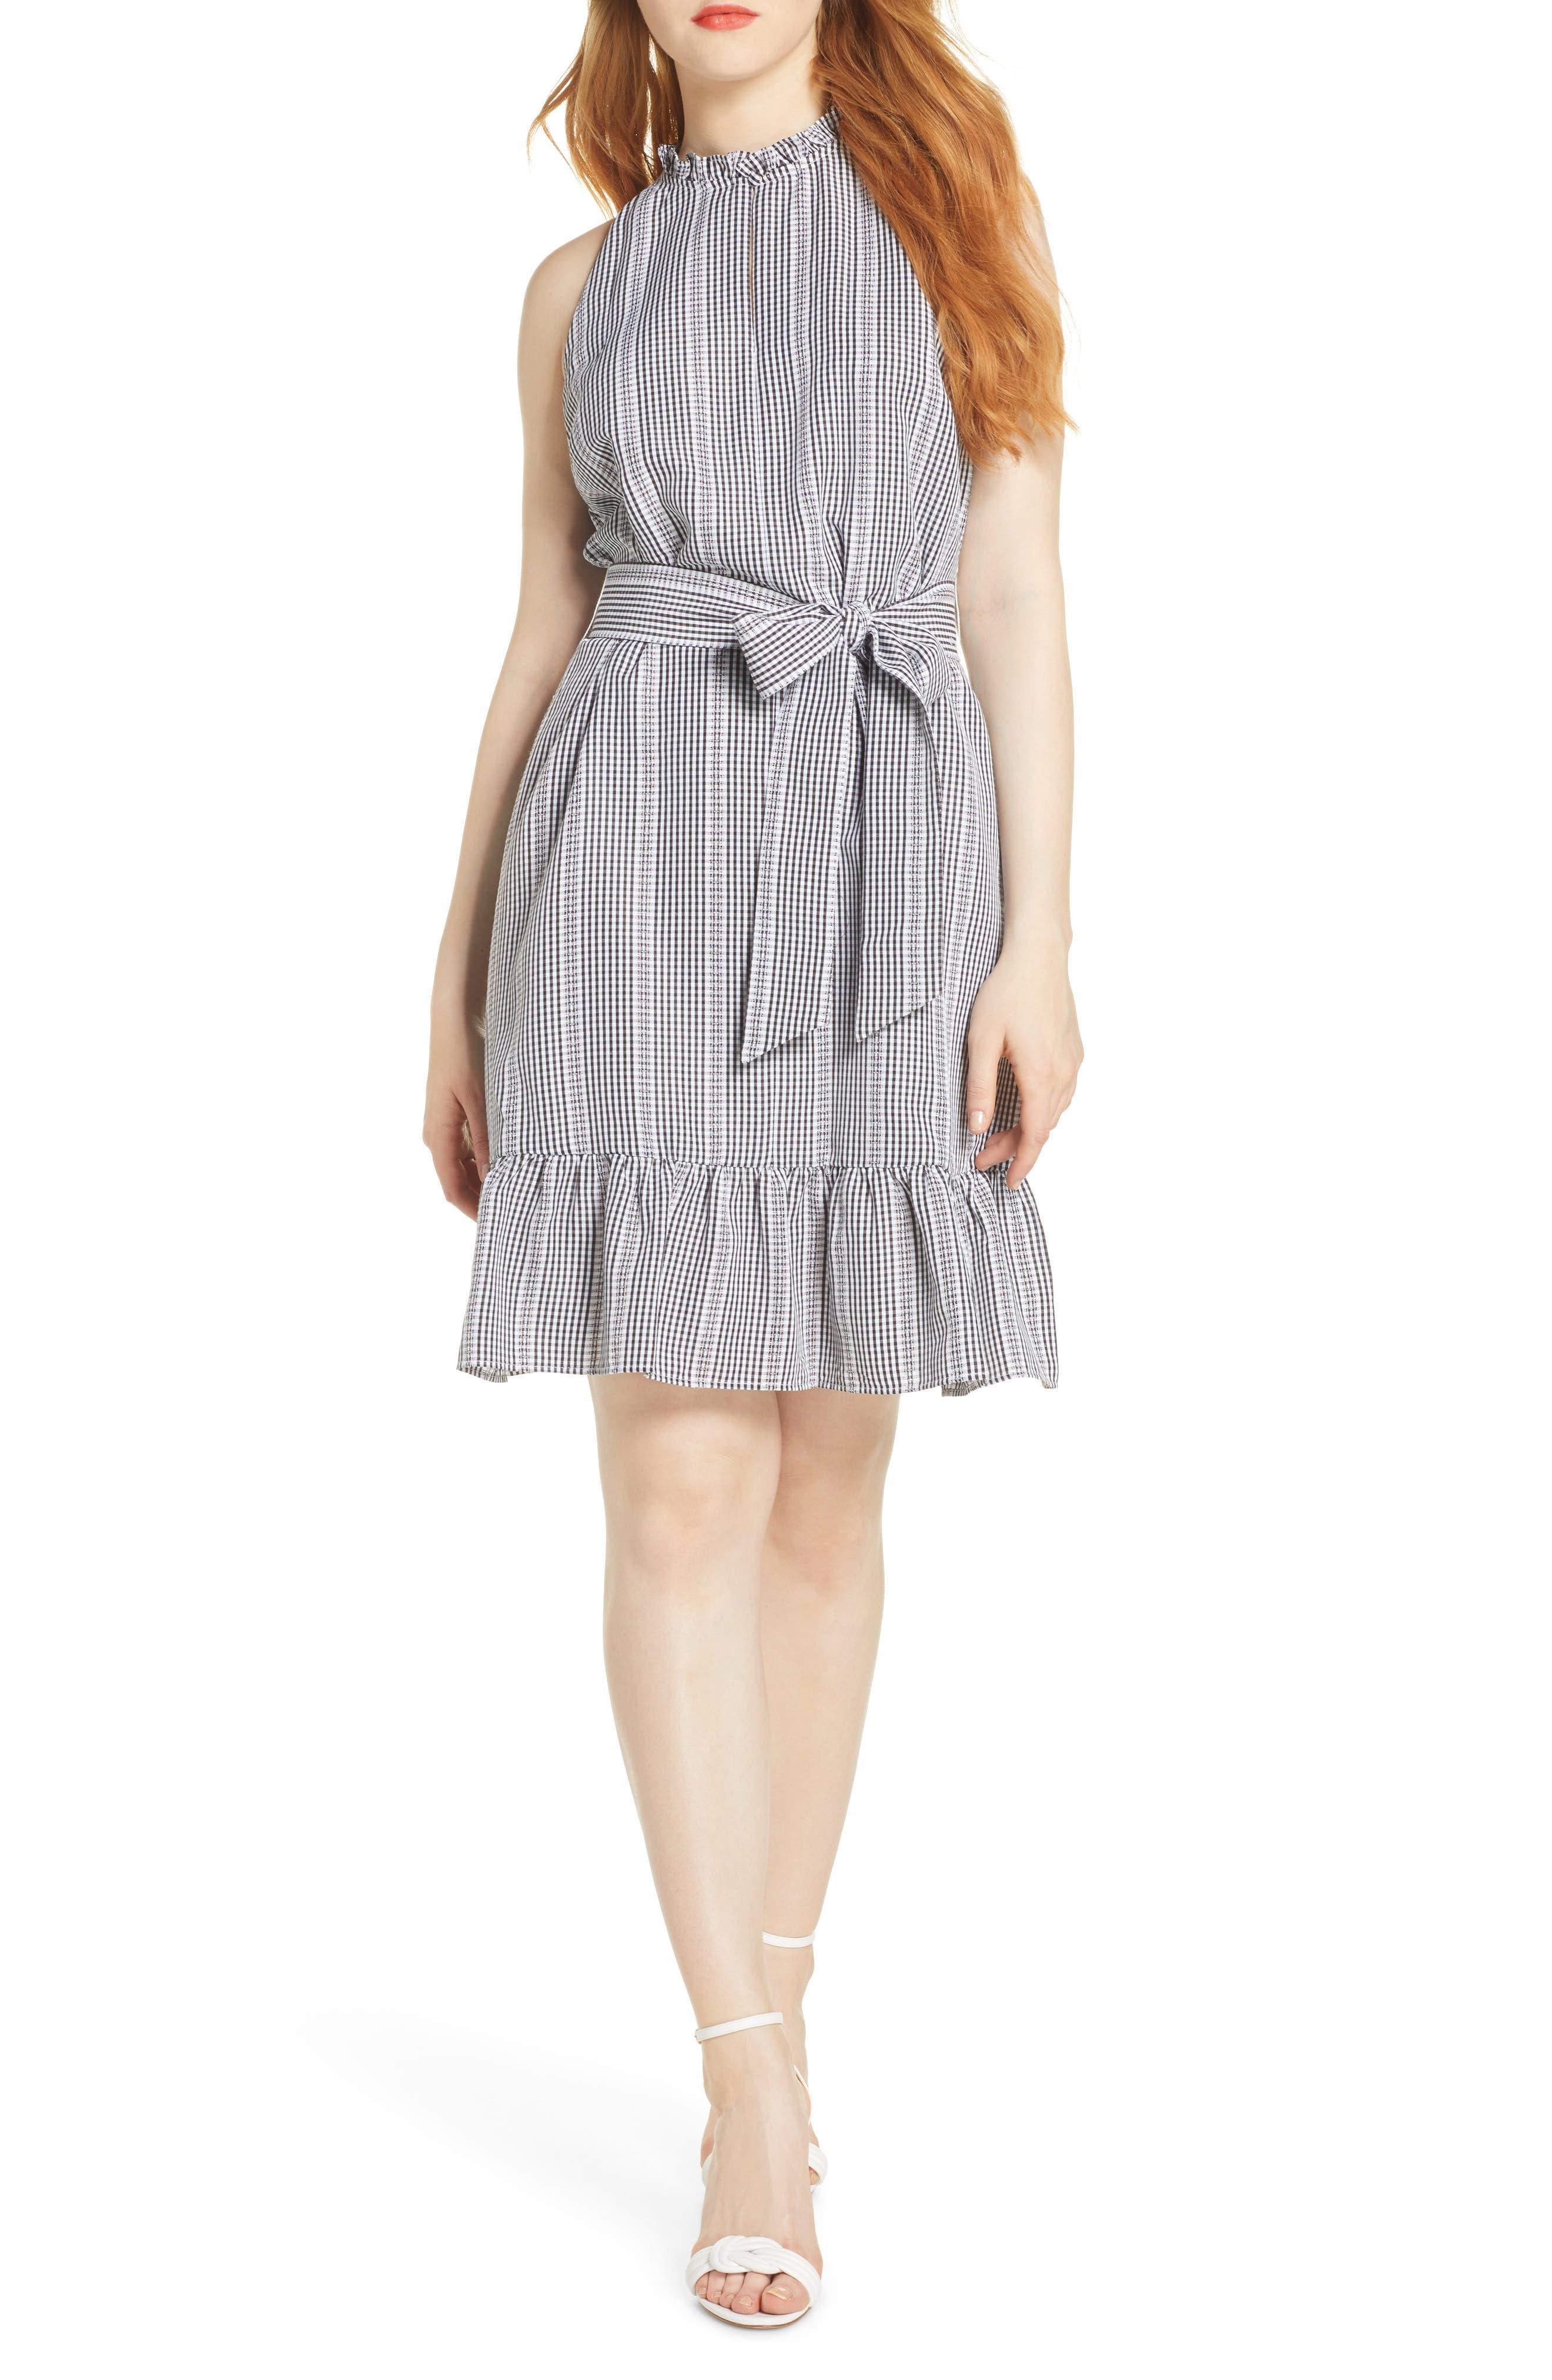 Sam Edelman Ruffle Gingham A-Line Dress, Black